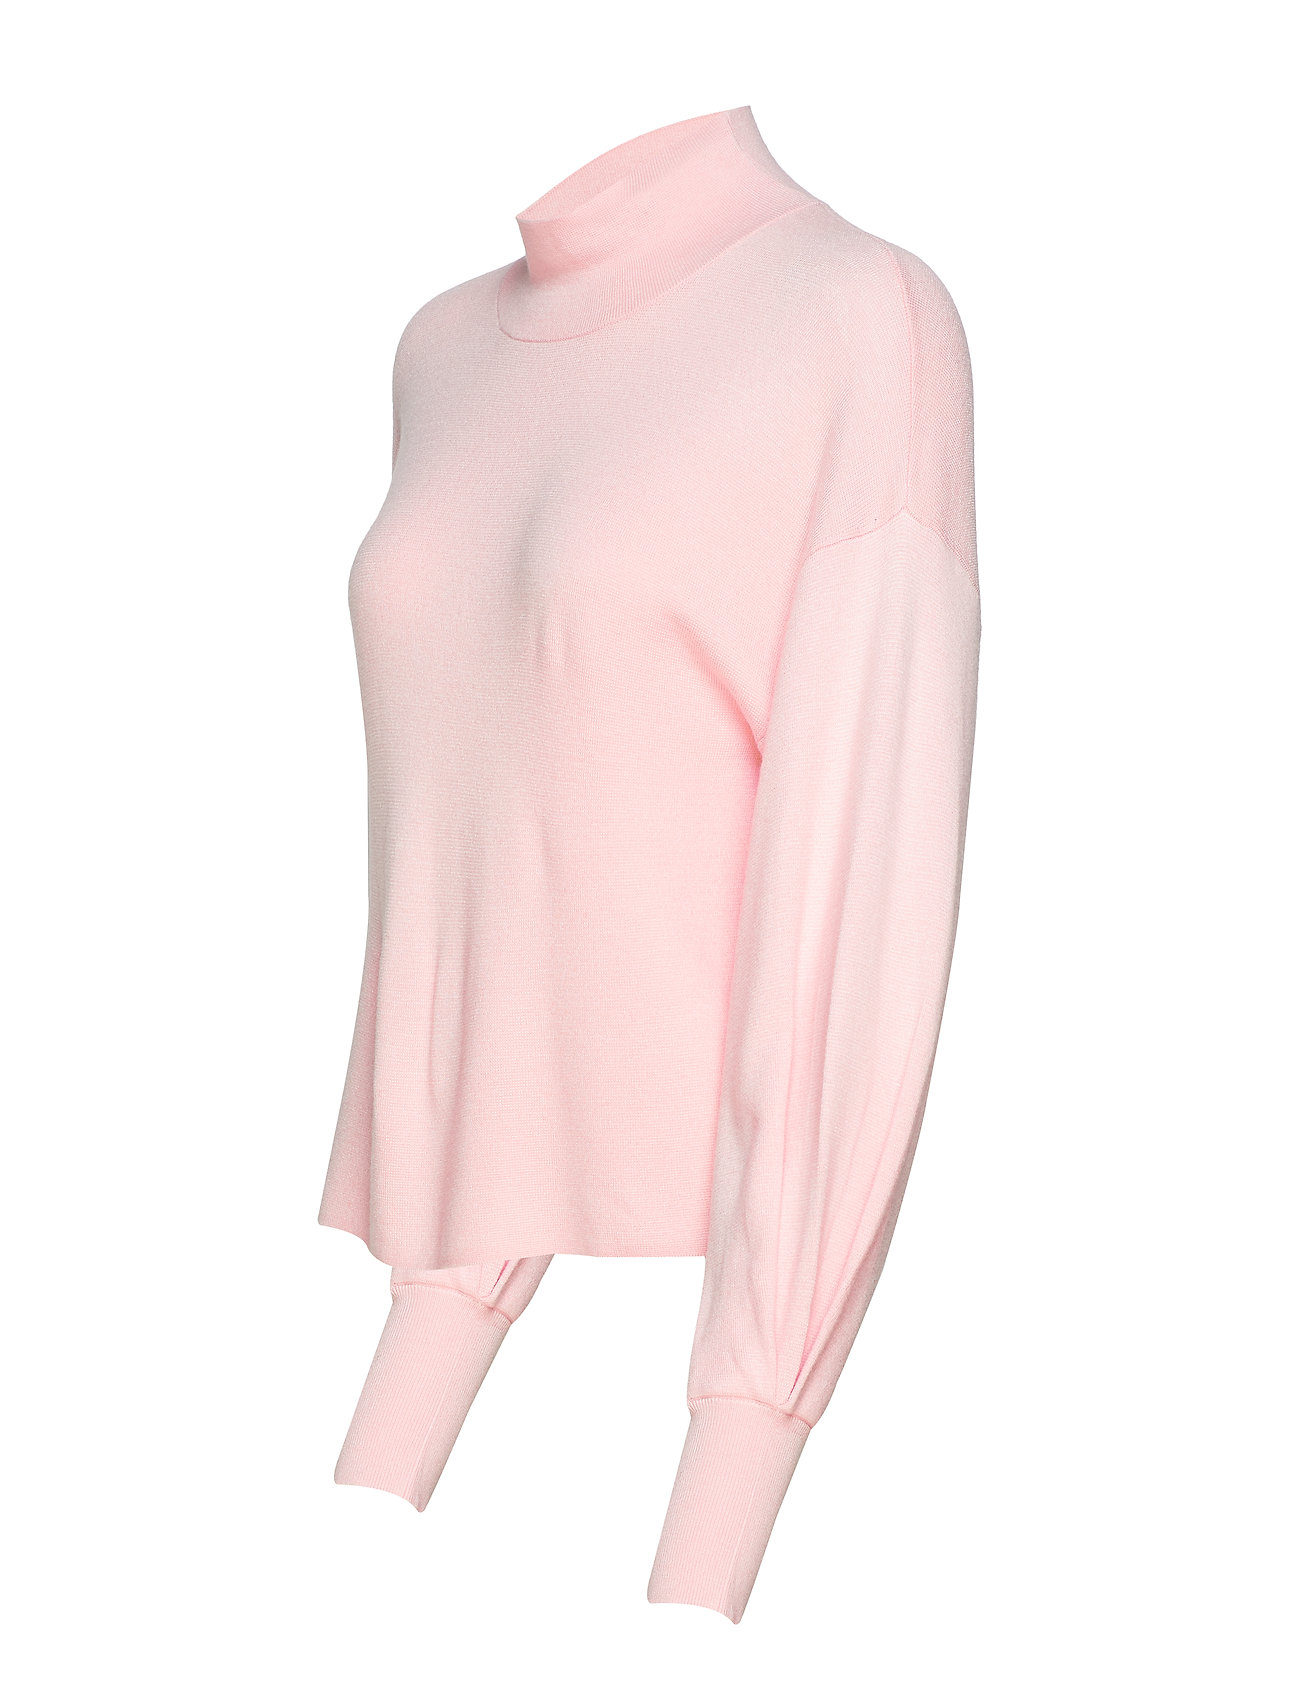 Wanetta QuartzInwear Pulloverrose Pulloverrose QuartzInwear Wanetta Wanetta Pulloverrose Ib2eHYWED9